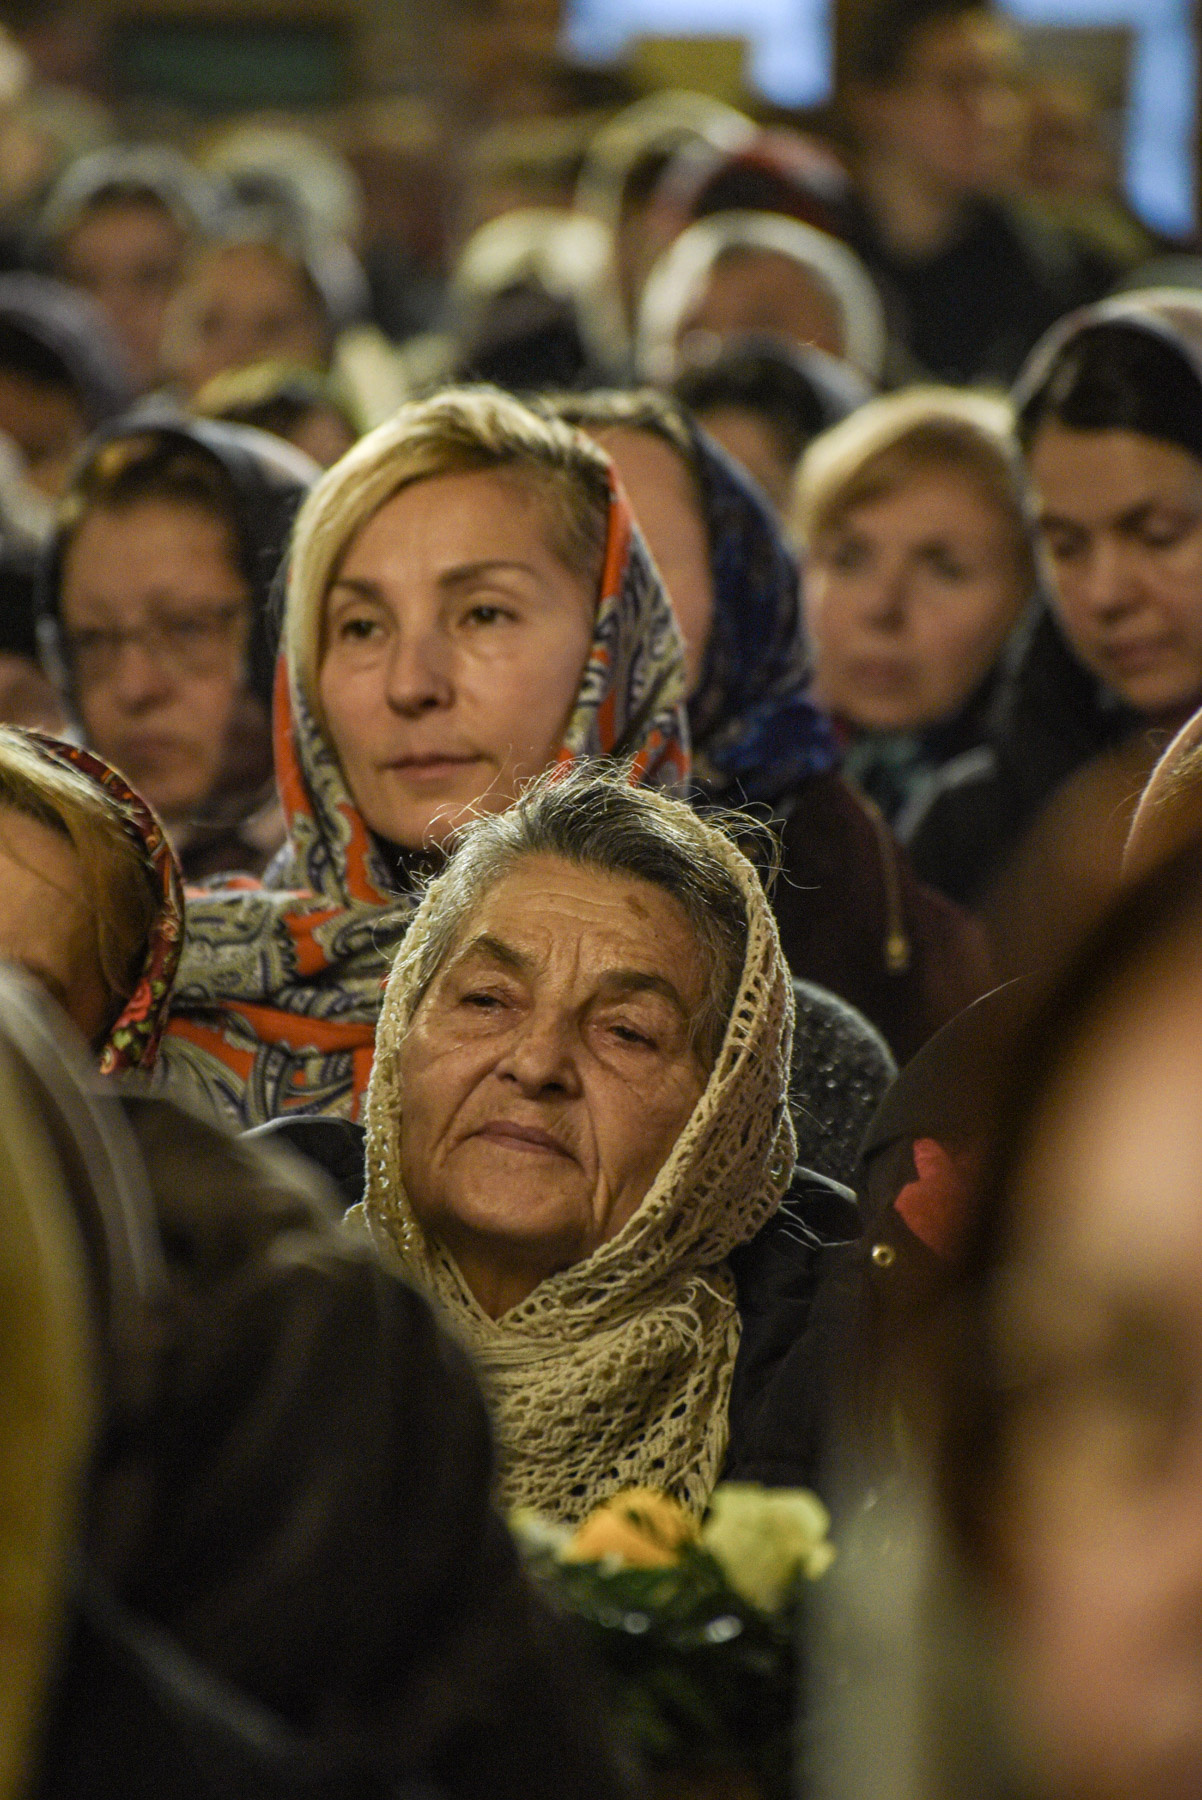 photos of orthodox christmas 0218 2